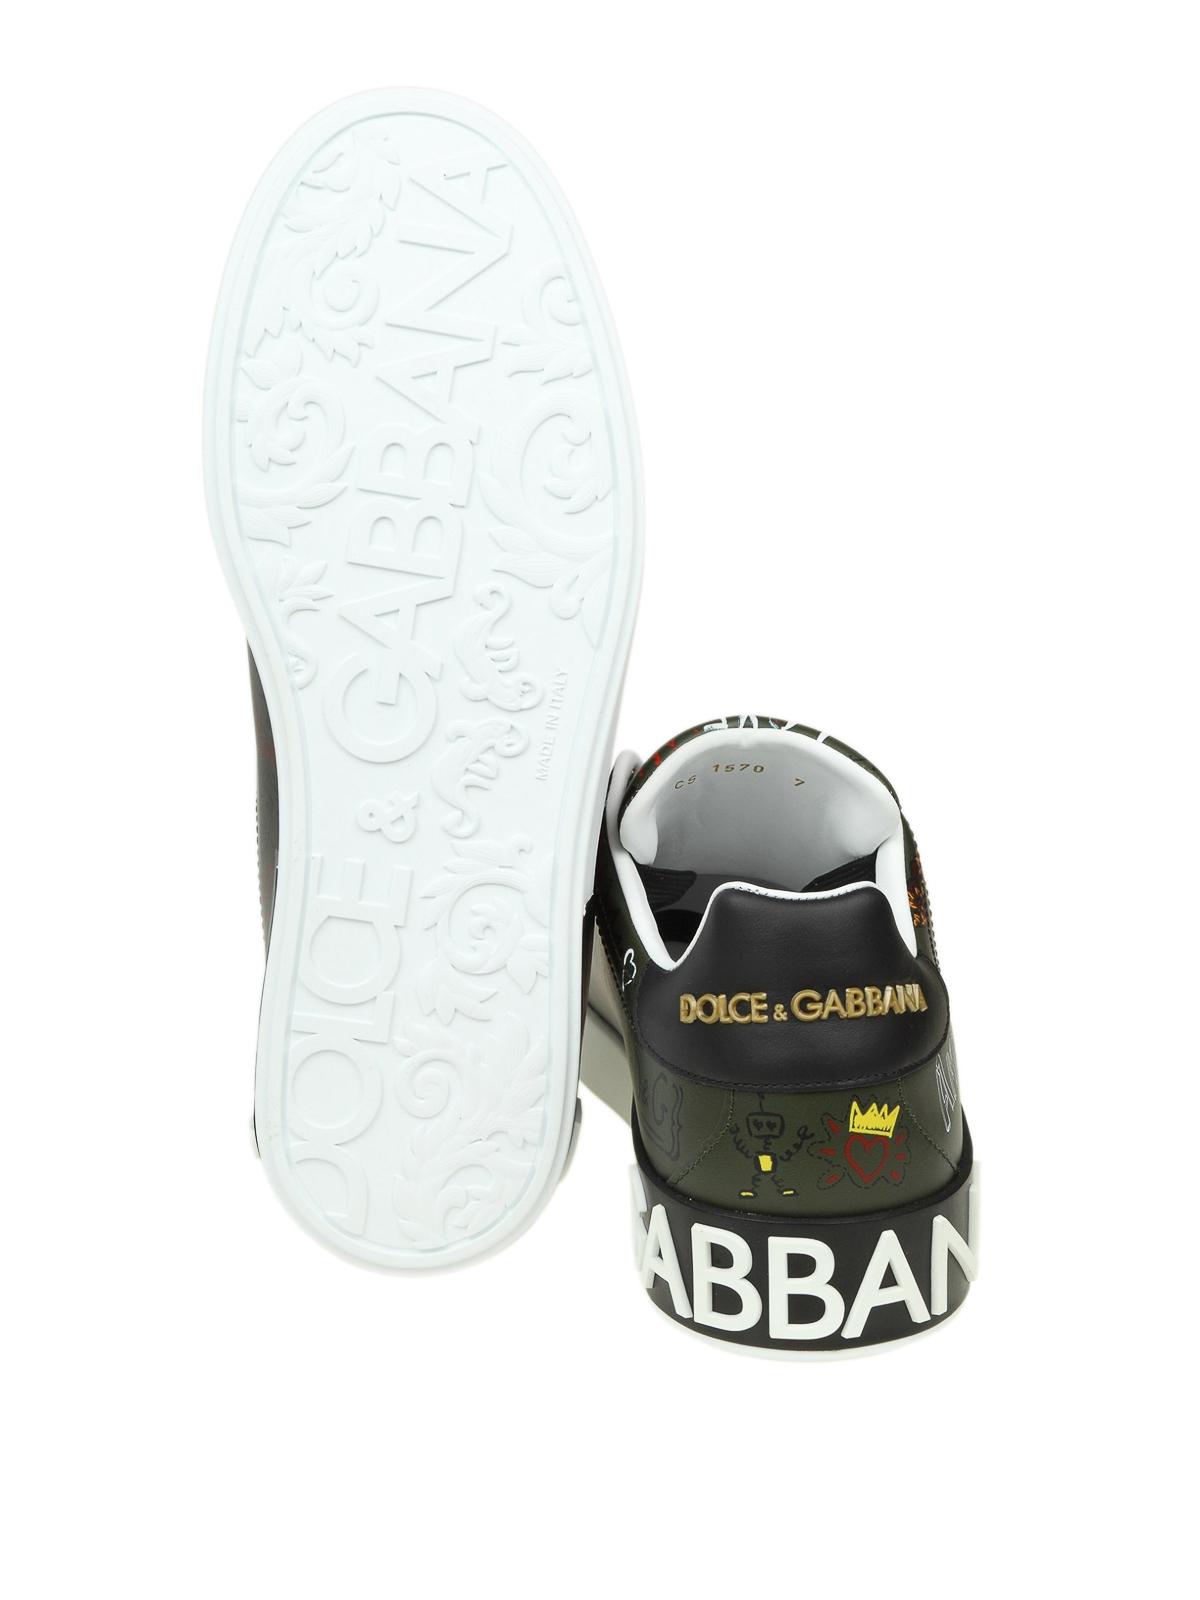 0fcb6a07 DOLCE & GABBANA buy online Graffiti print army green Portofino sneakers